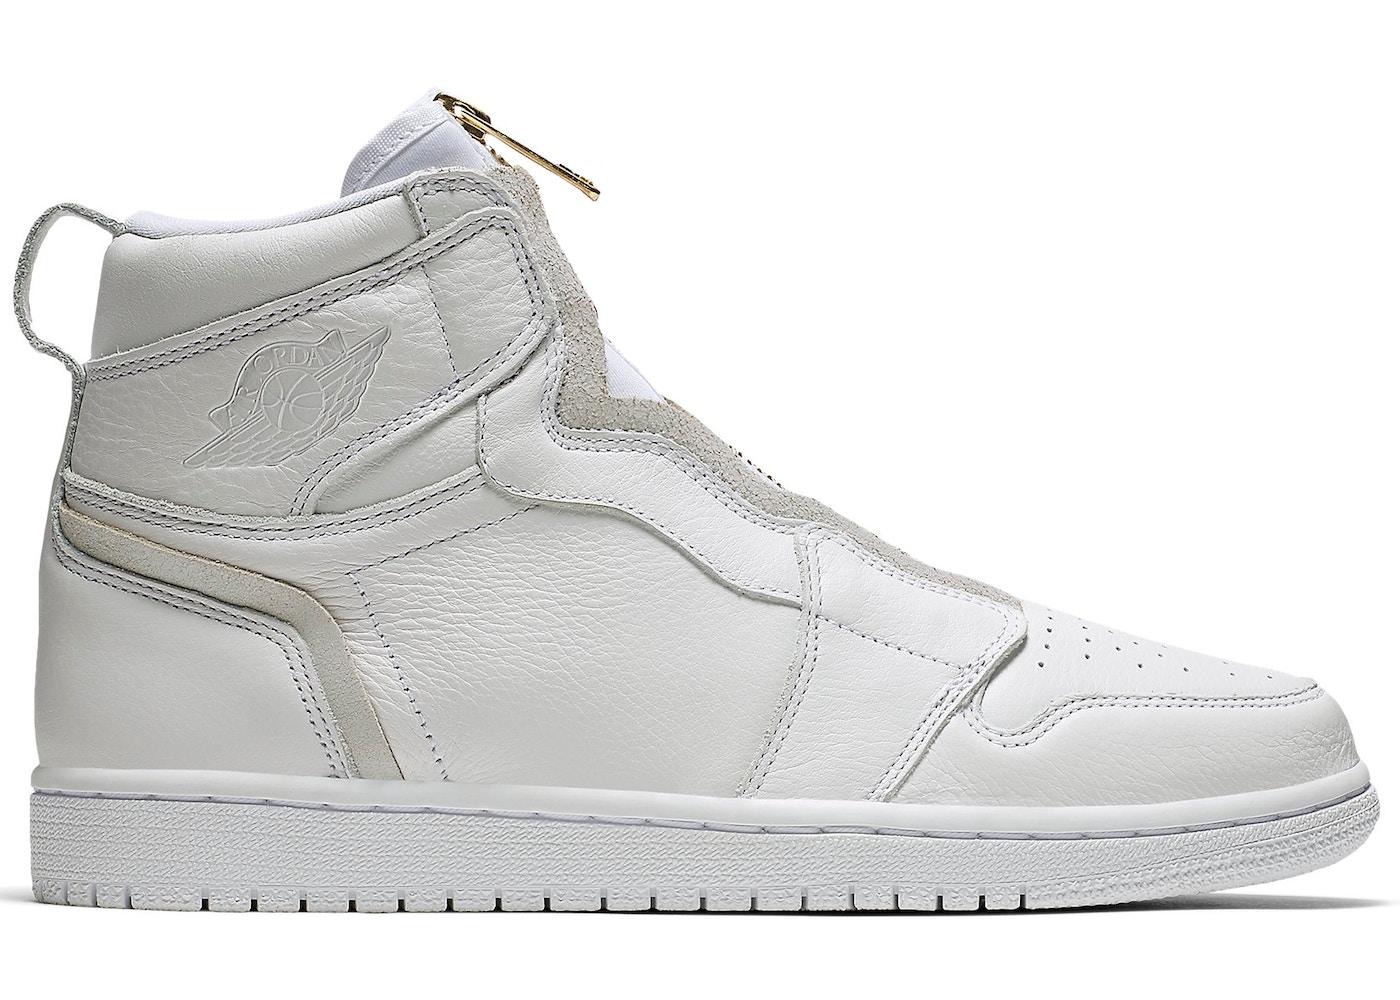 0ab0e14edb4 Jordan 1 Retro High Zip White (W) - AQ3742-116